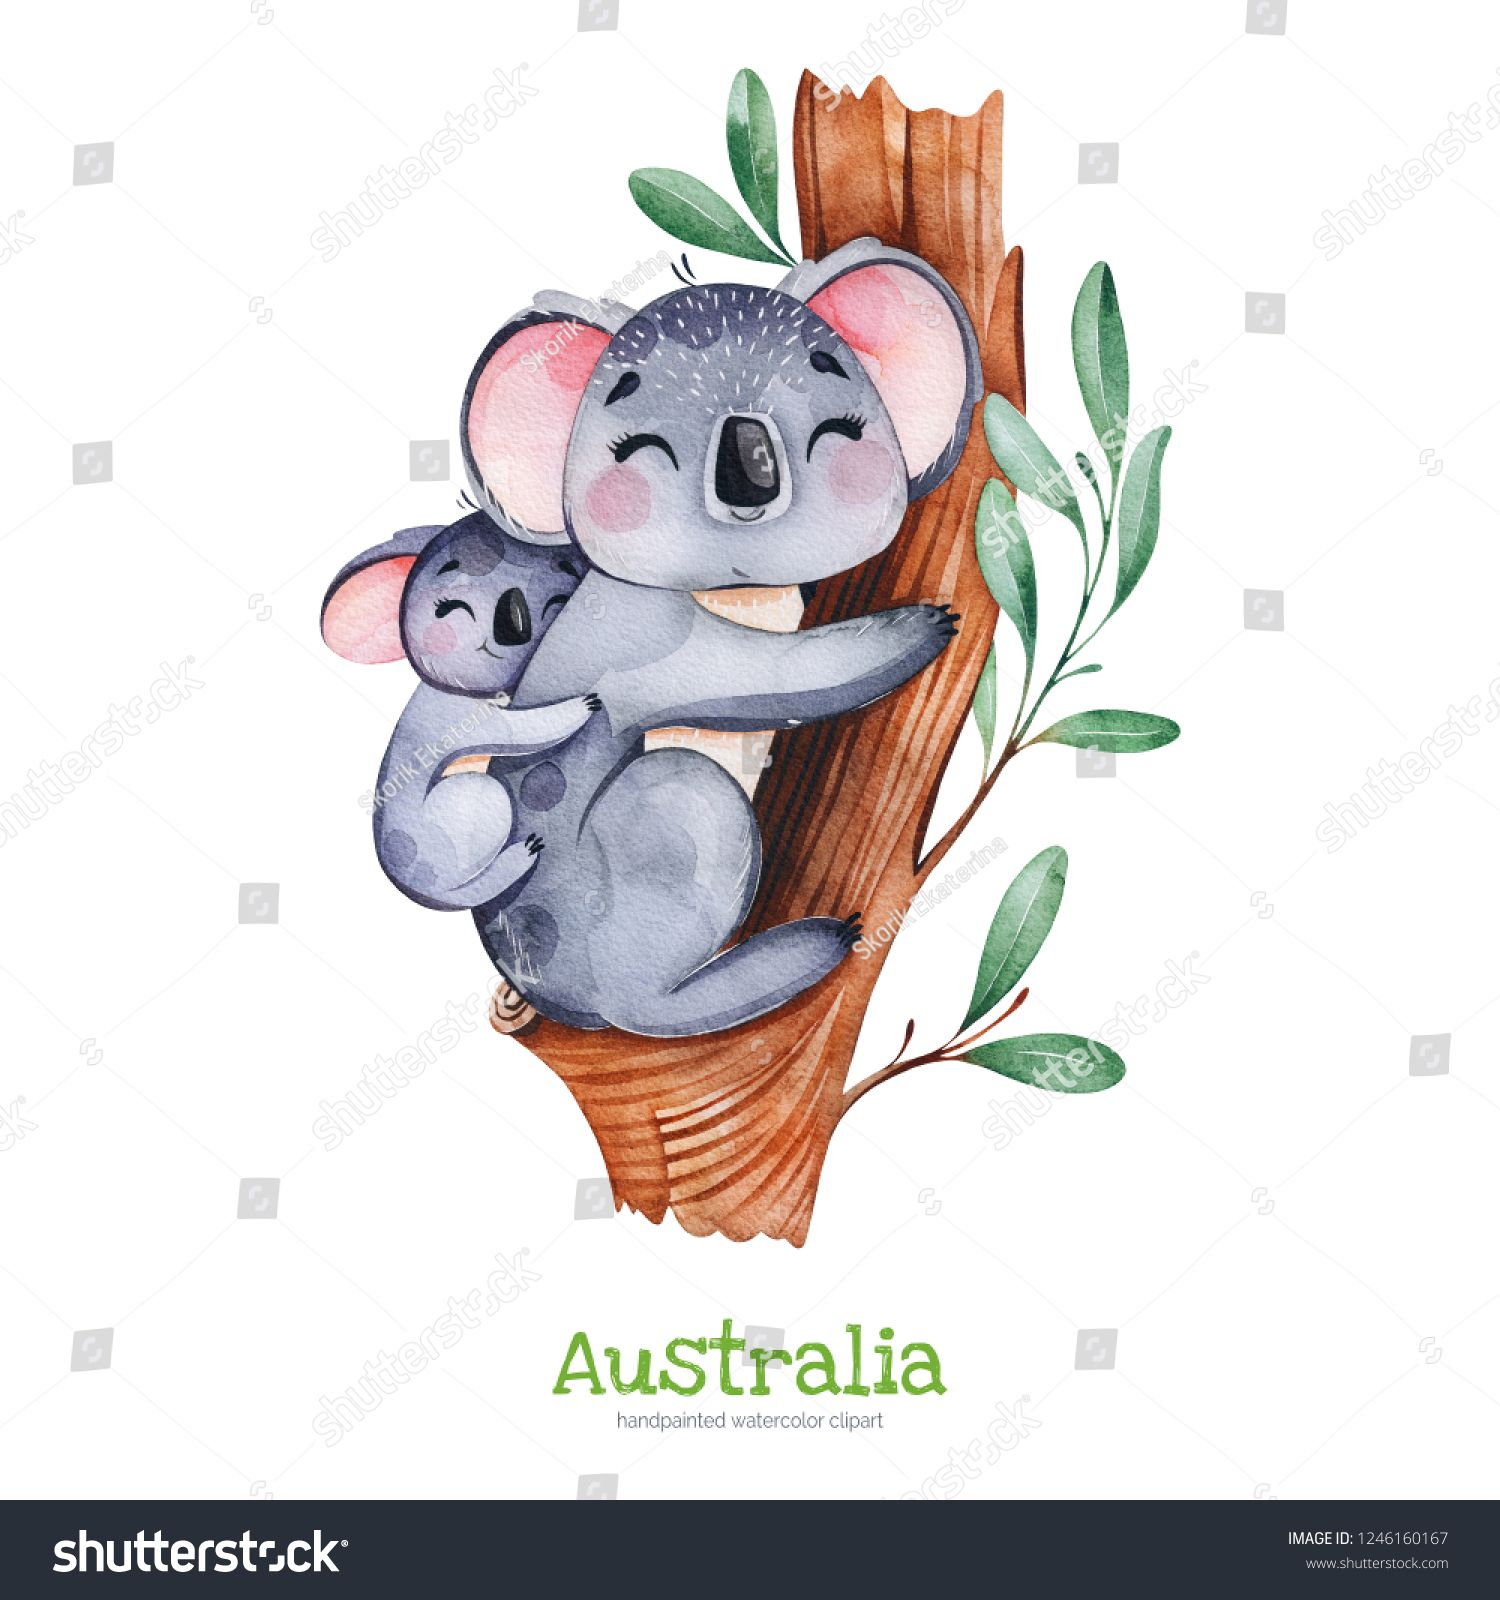 Australia Watercolor Set Cute Koala With Baby On Eucalyptus Tree Watercolor Animals Perfect For Wallpa Baby Animal Drawings Koala Drawing Nursery Animal Prints